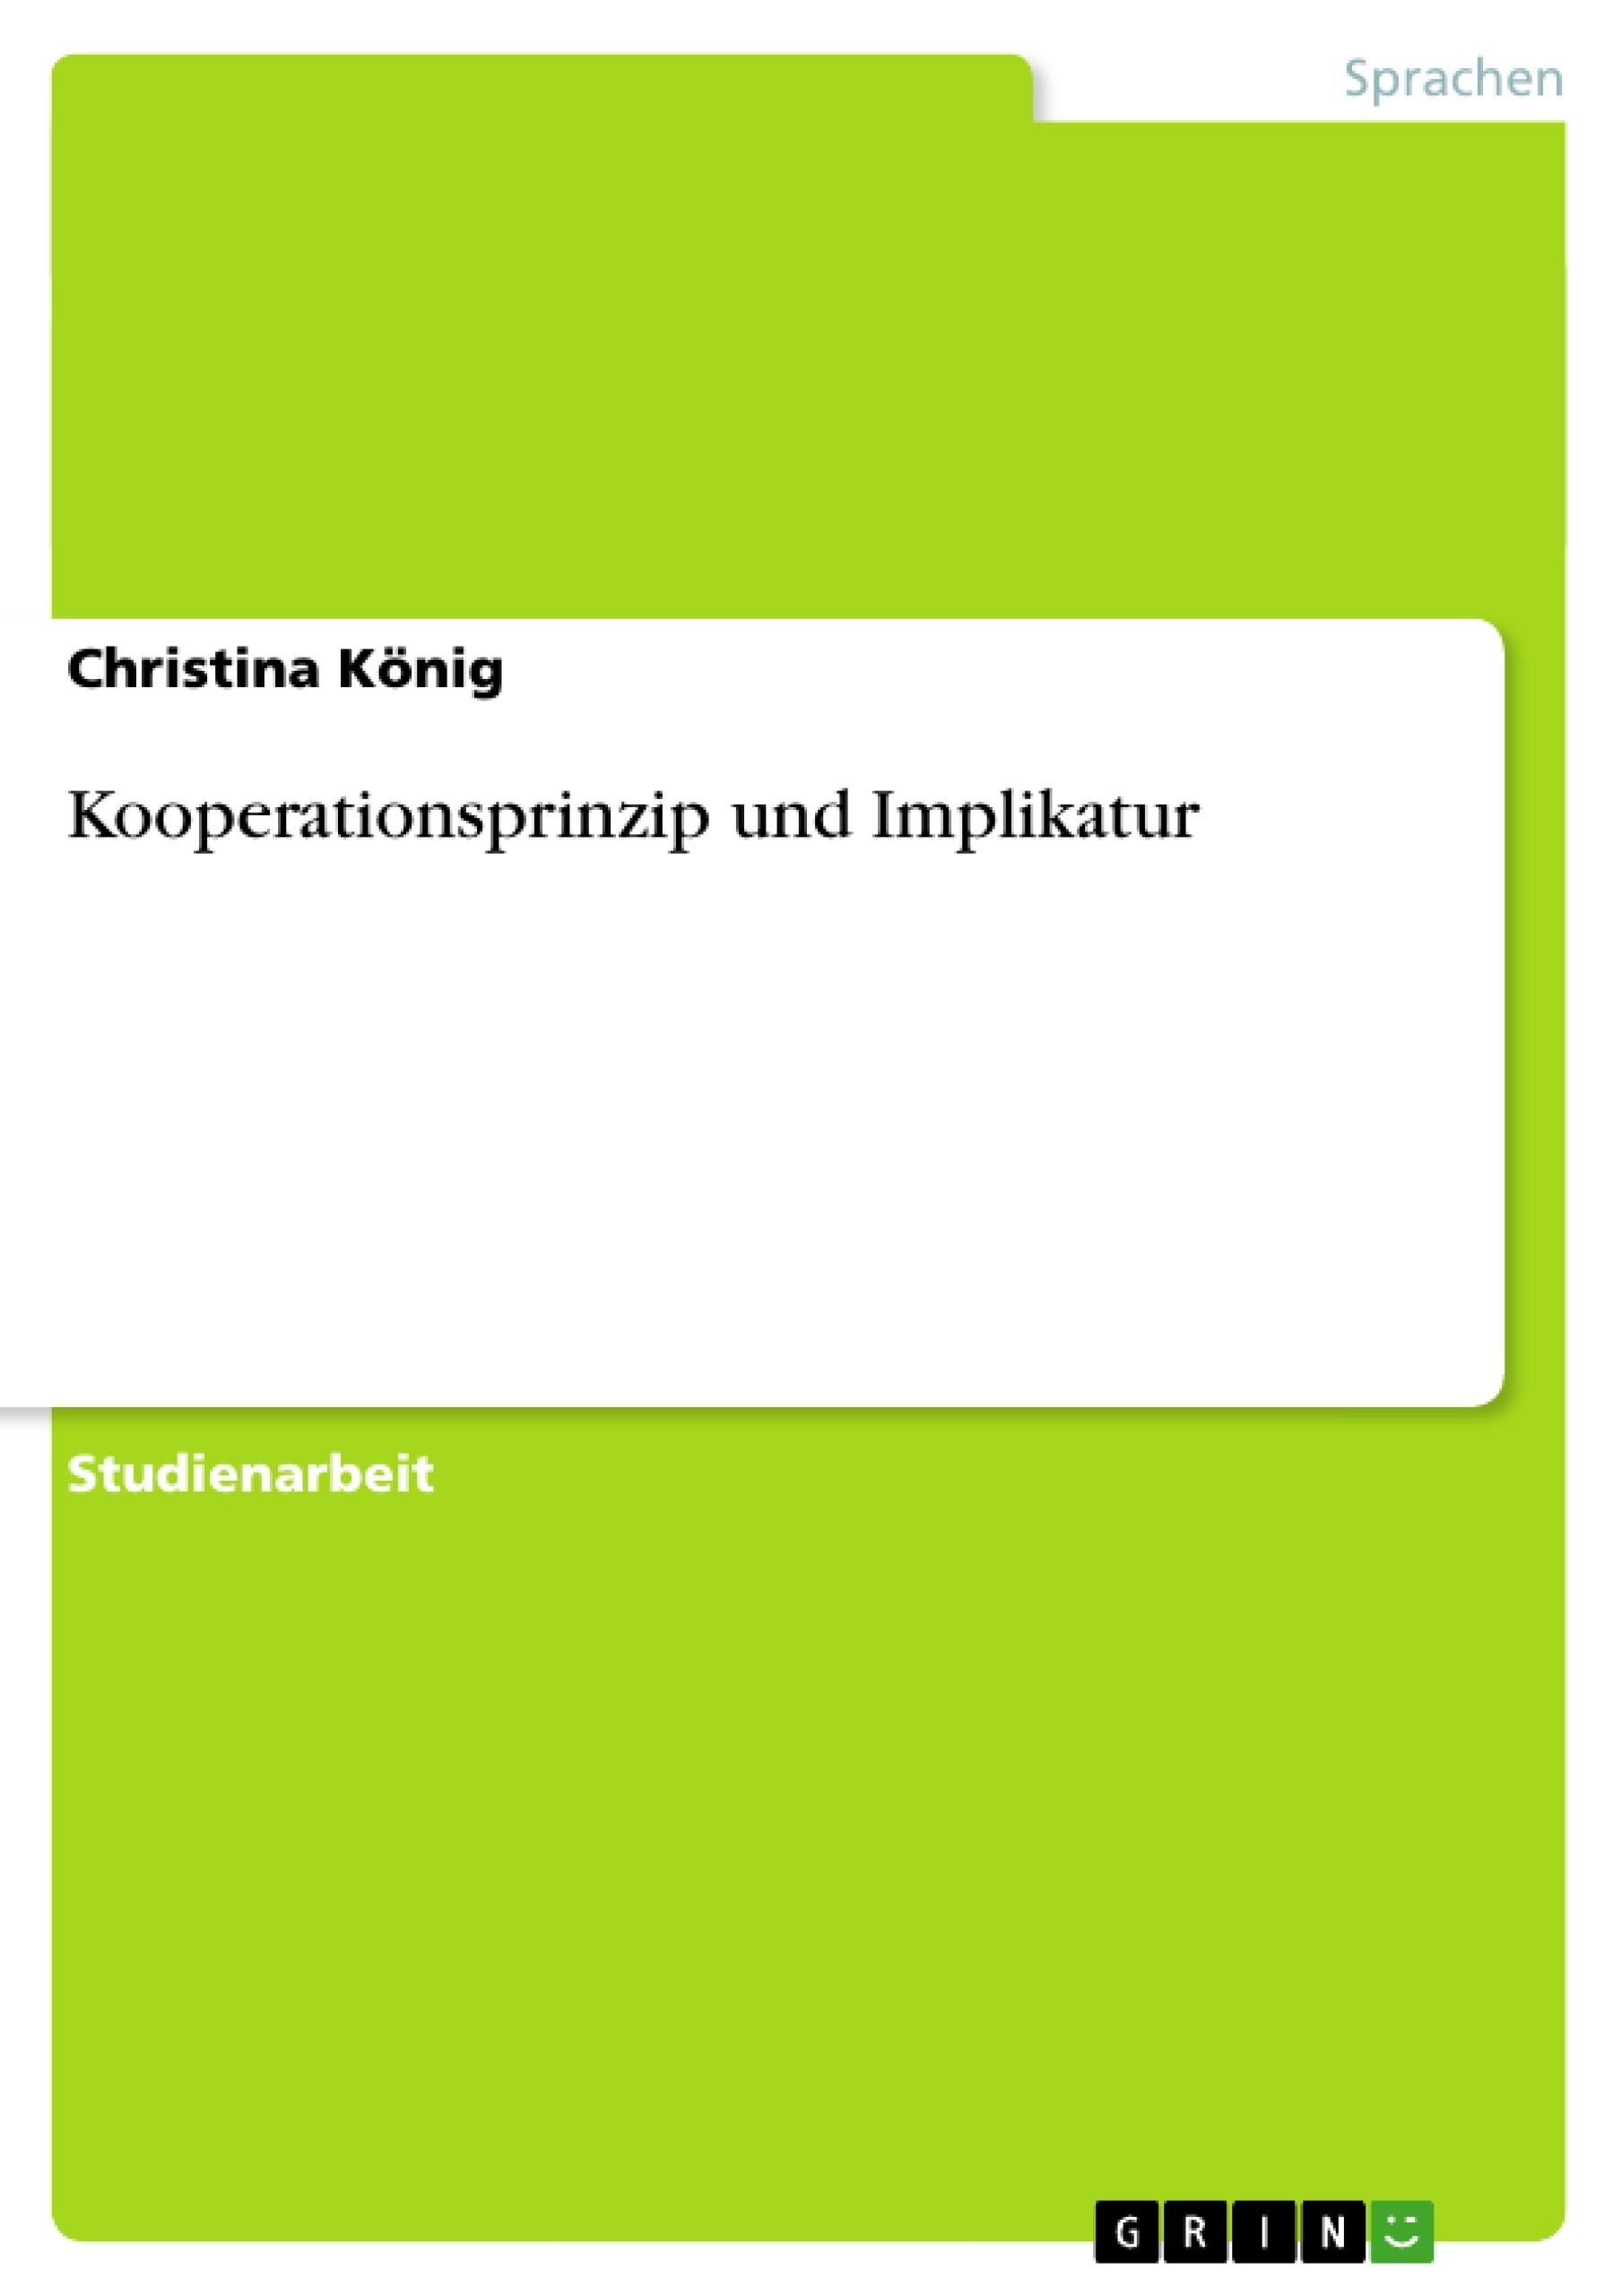 Titel: Kooperationsprinzip und Implikatur